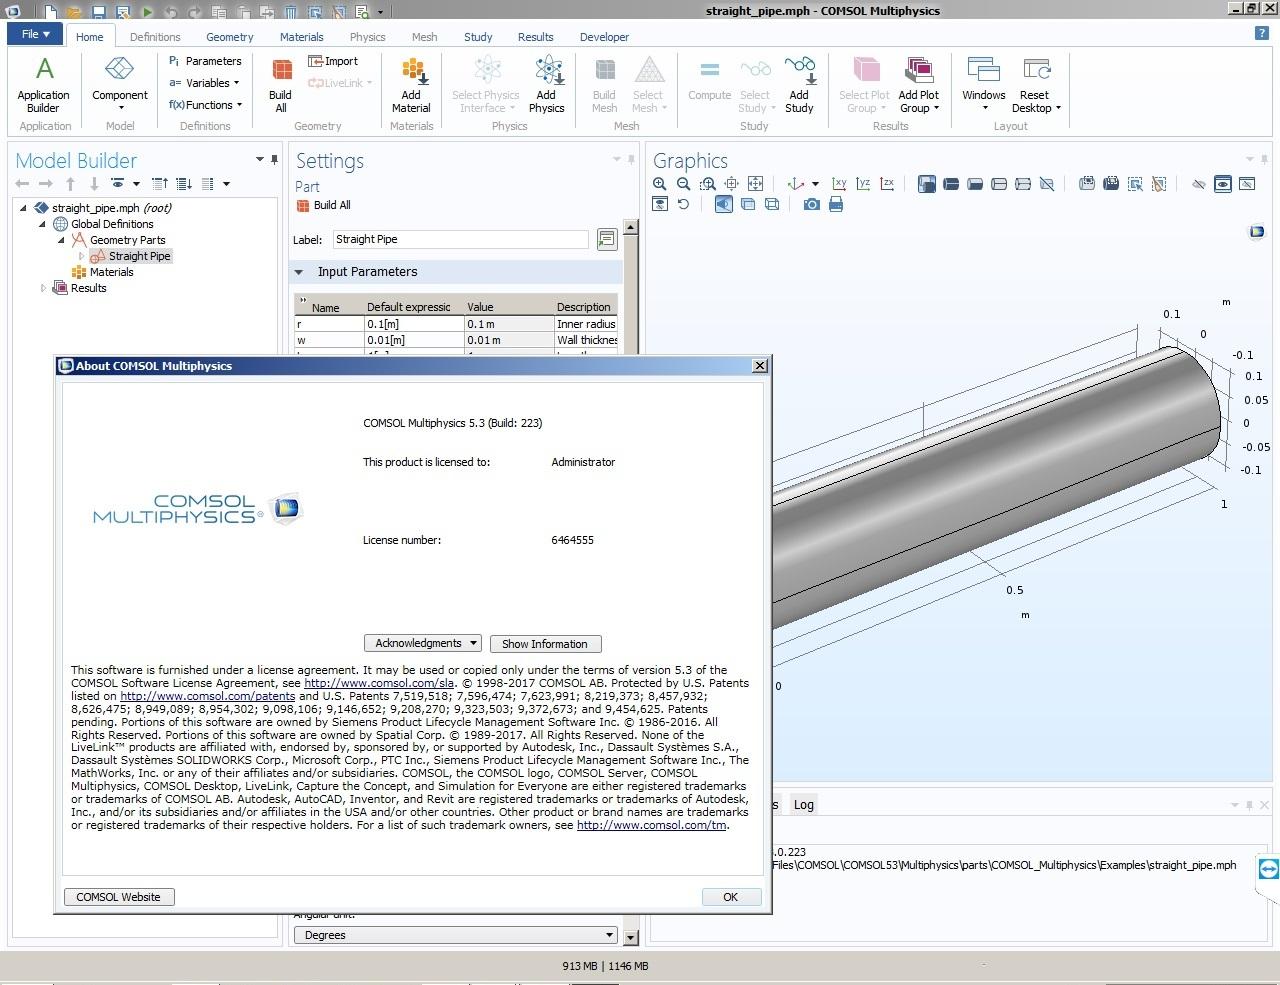 Comsol Multiphysics 5.3 Full